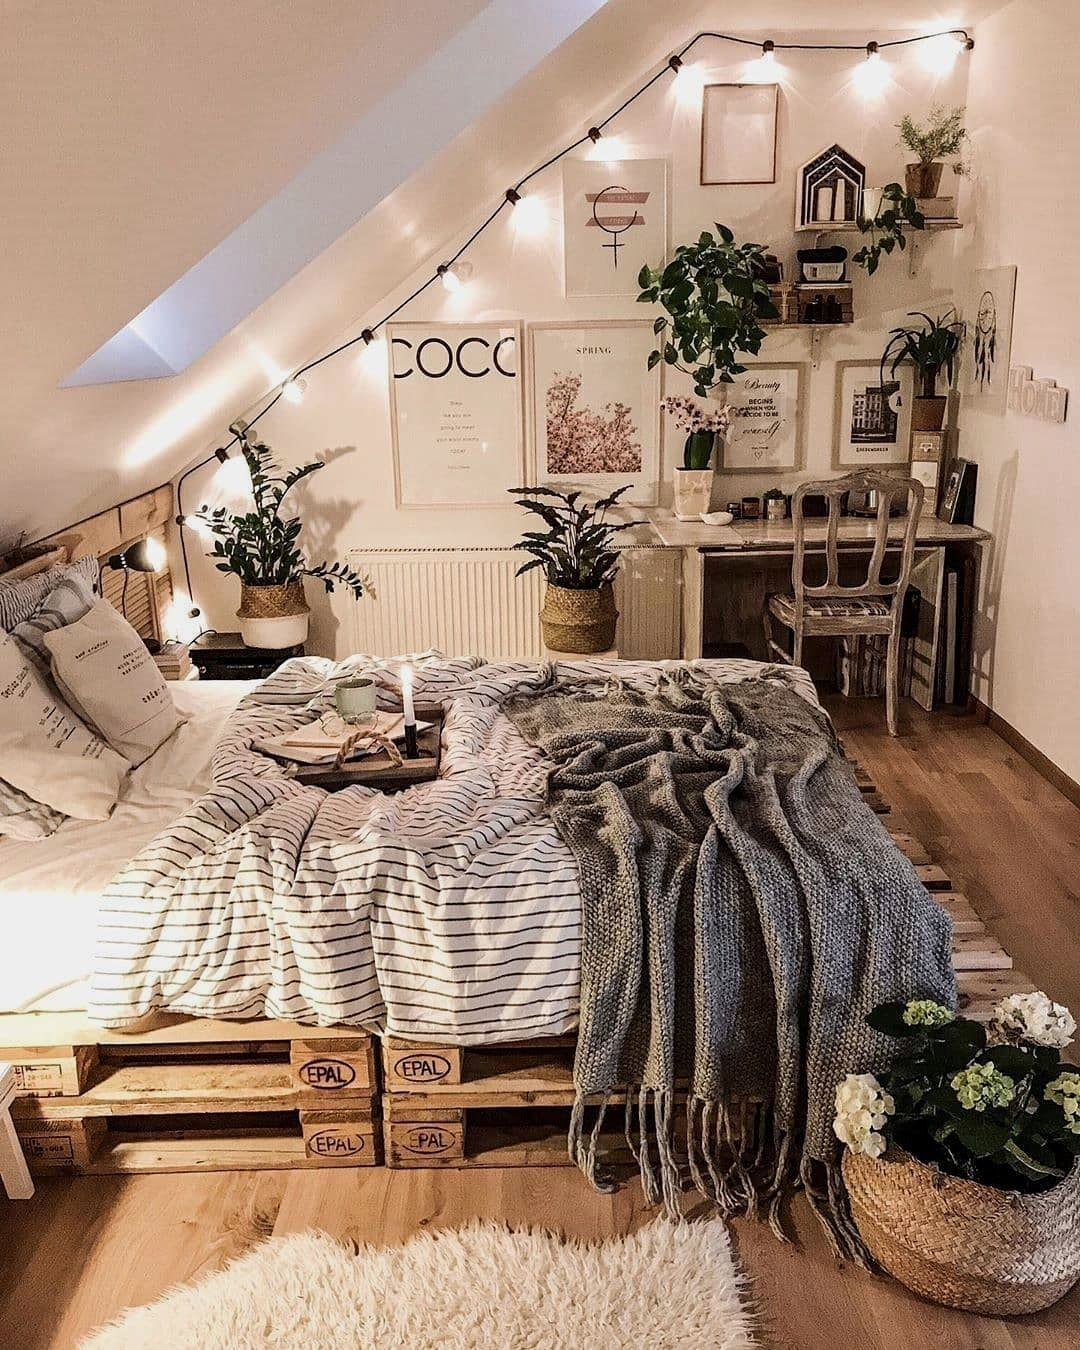 Creative Bedroom Decorating Ideas In 2020 Apartment Decor Small Apartment Decorating Bedroom Decor